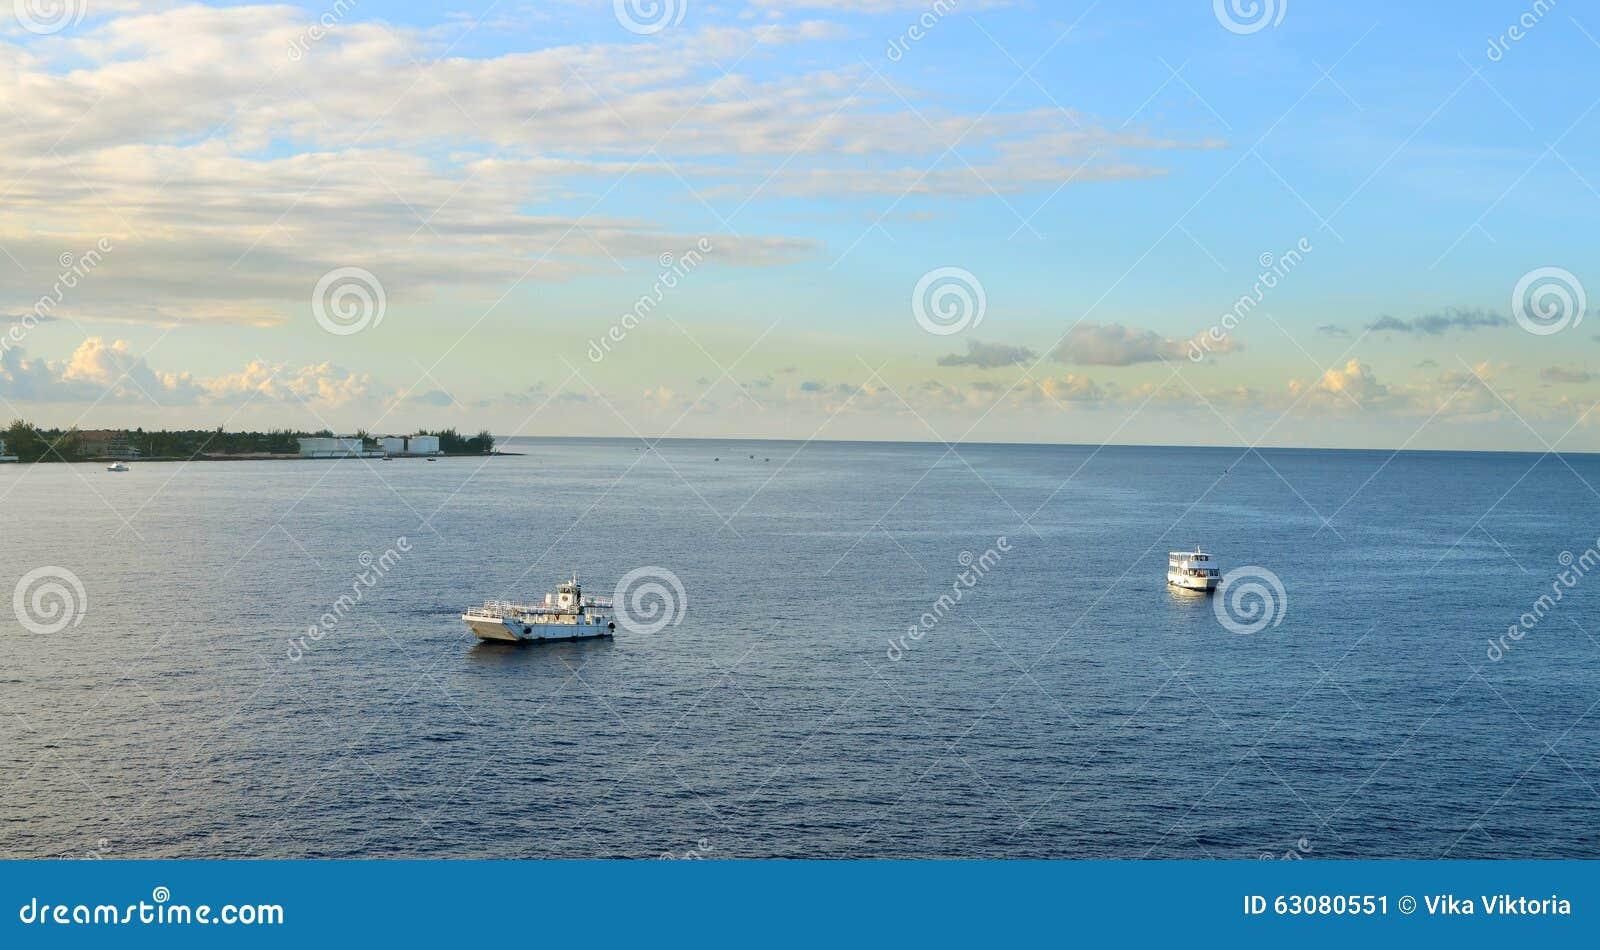 Download Paysage De La Mer Des Caraïbes Image stock - Image du port, horizontal: 63080551